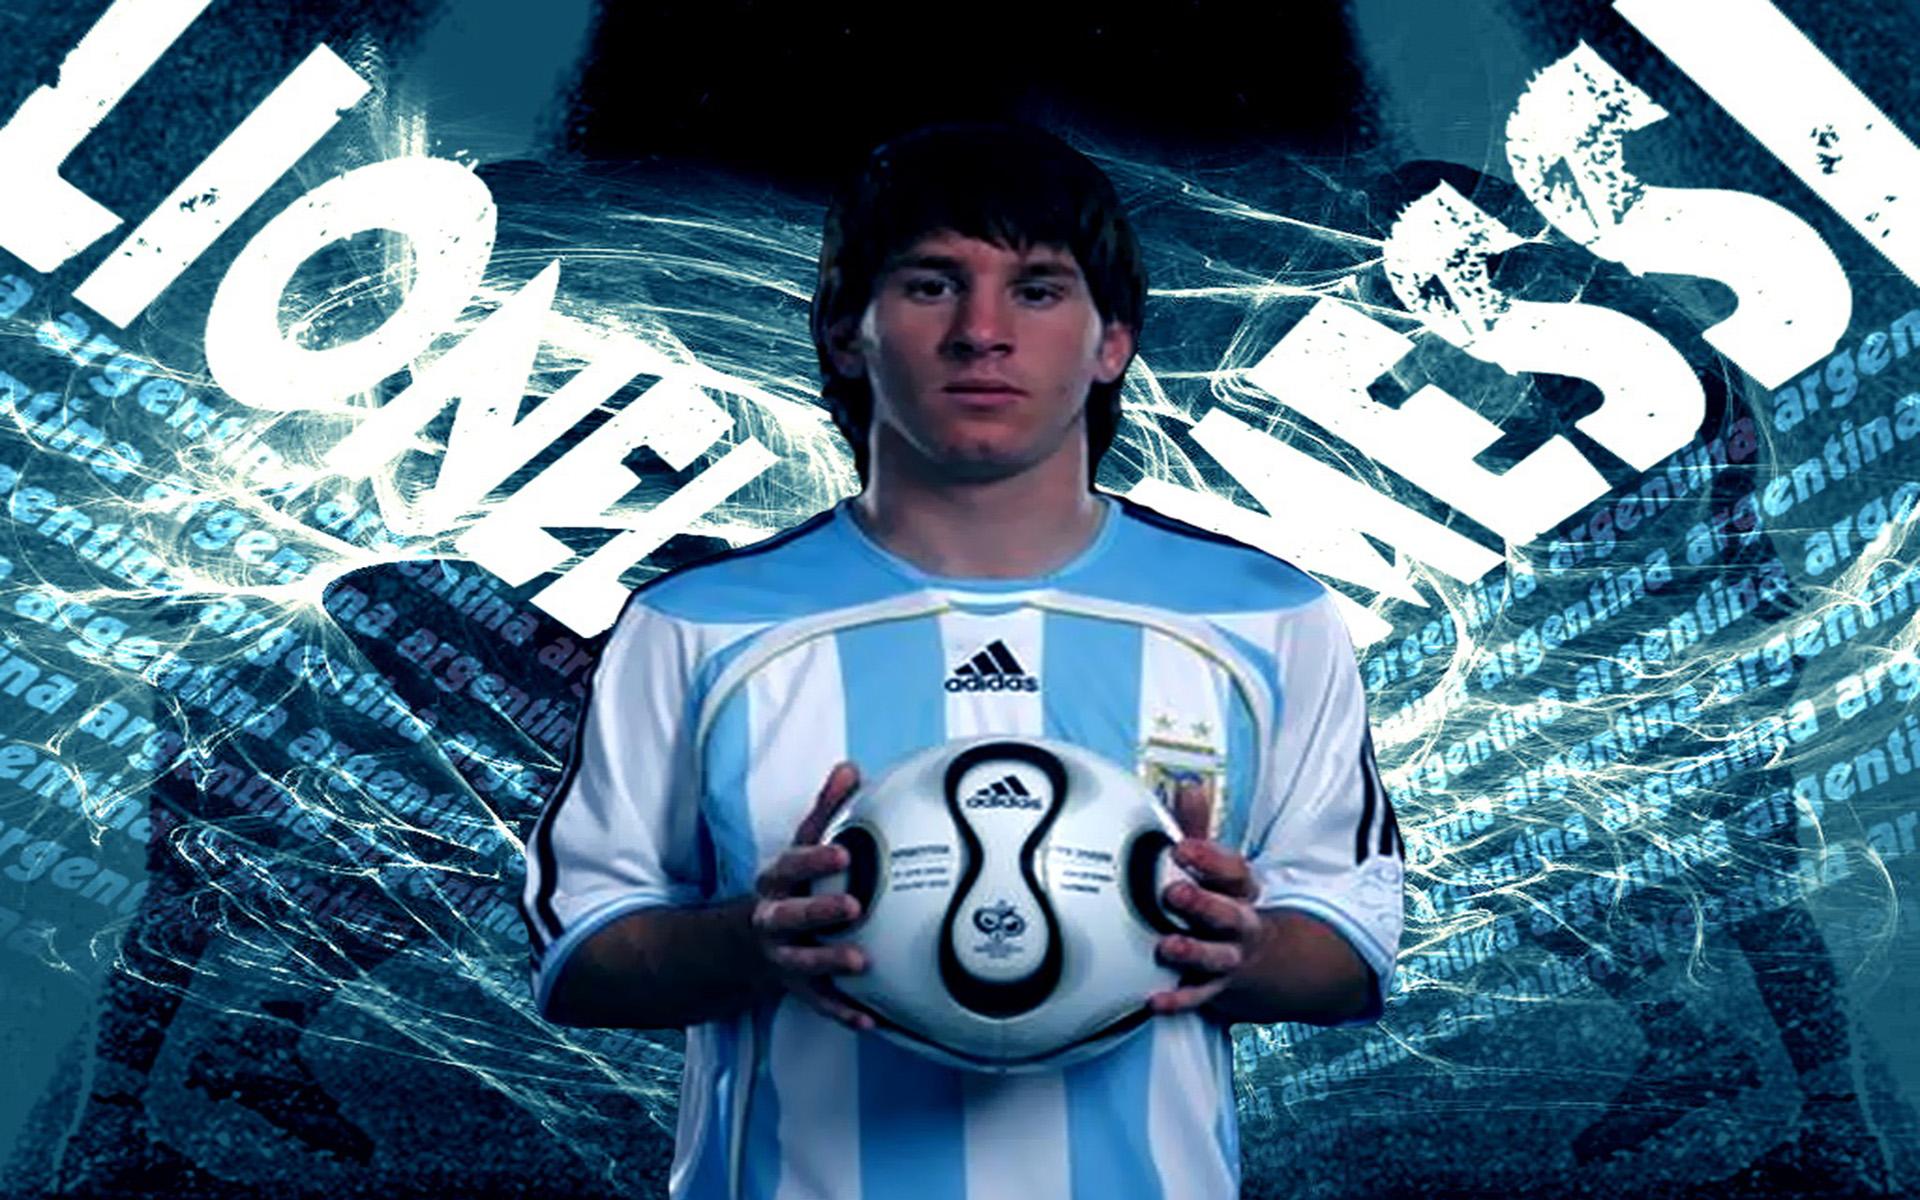 wallpaper hd messi con argentina